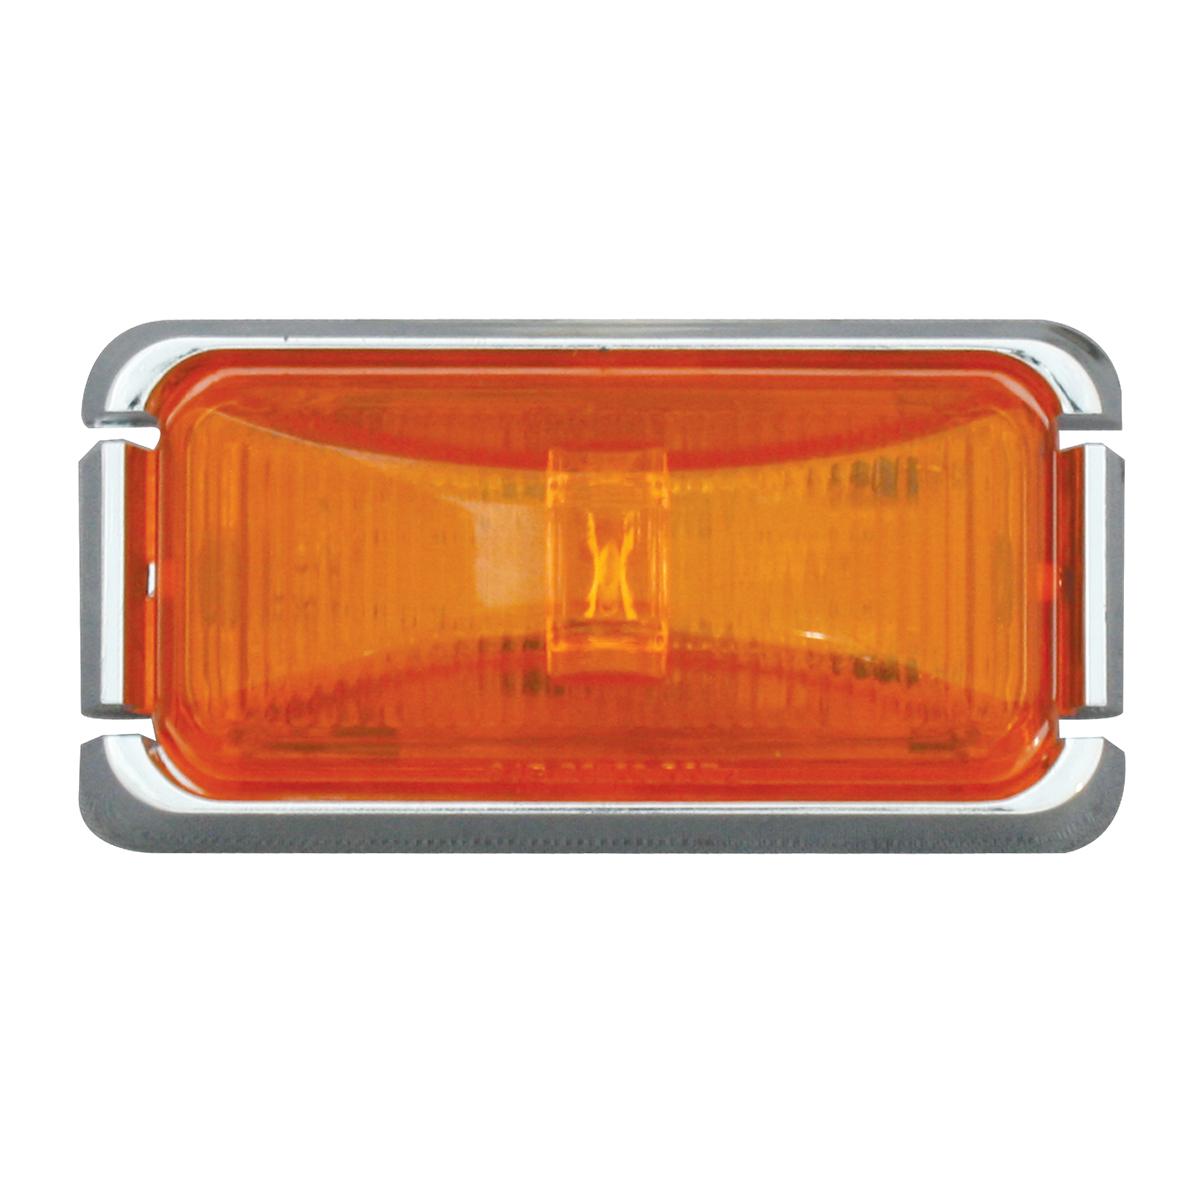 76415 Small Rect Fleet LED Light w/ Chrome Plastic Bracket